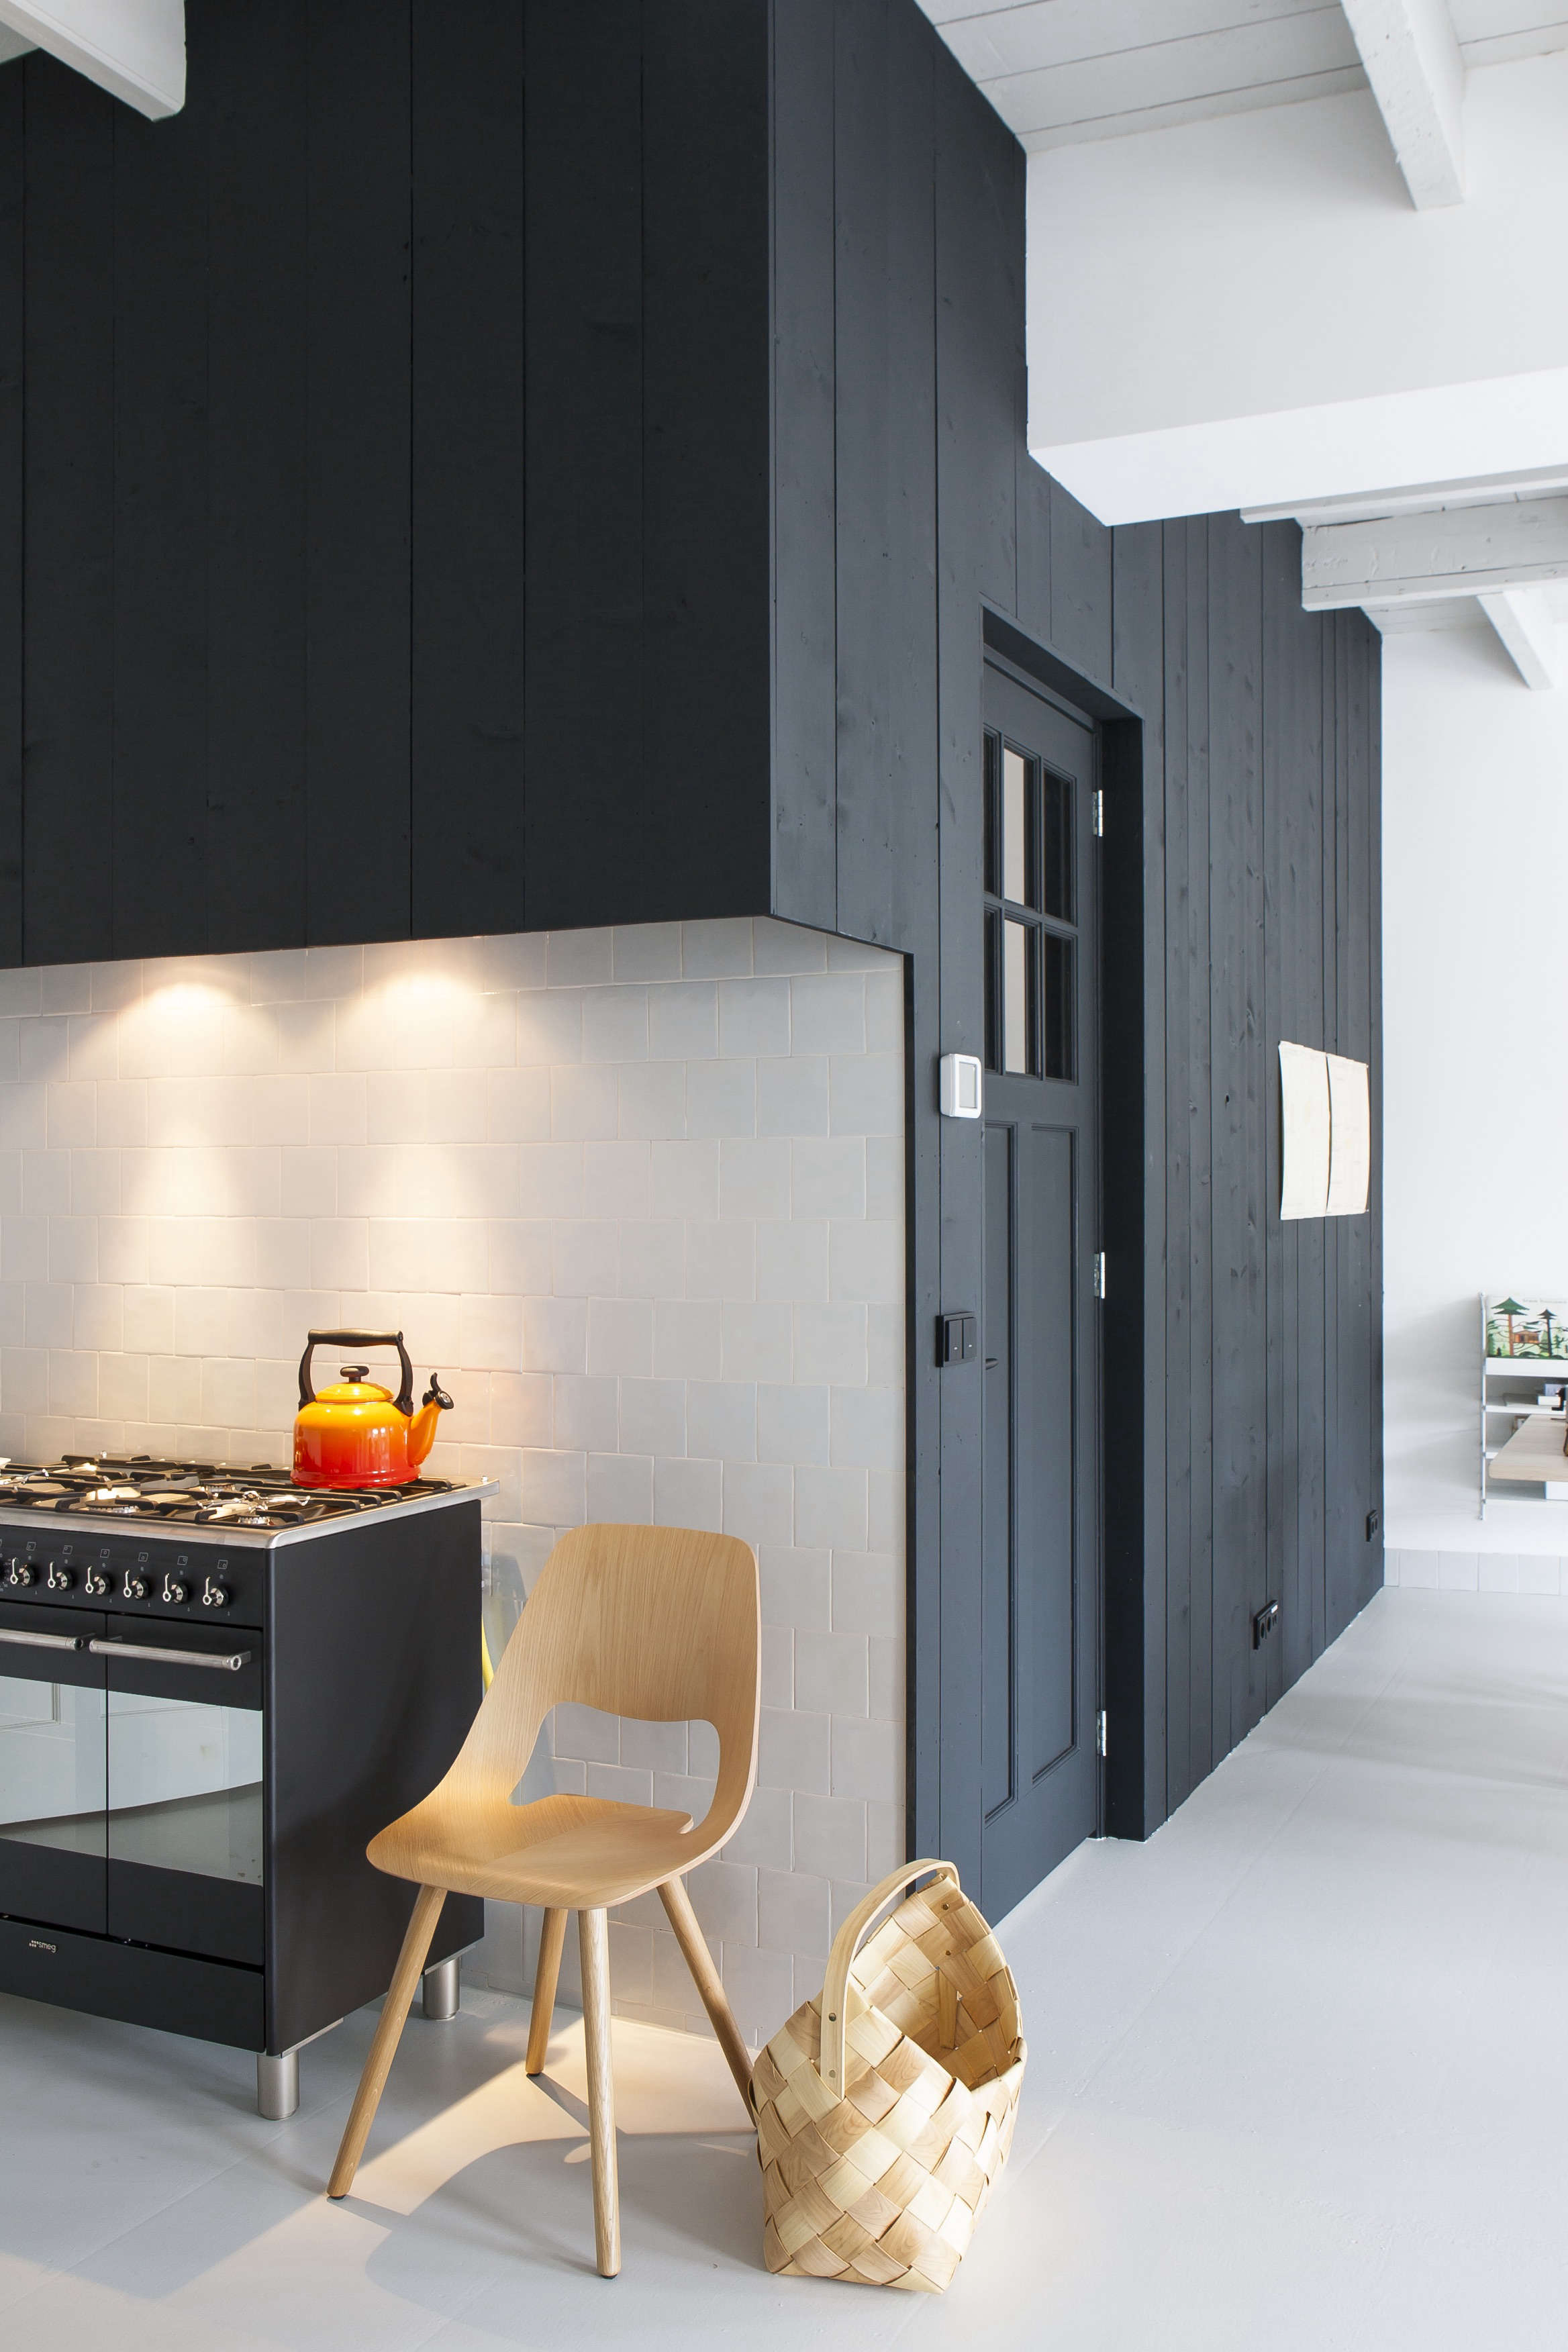 black stainedpinepanelingmatchesthe kitchen millwork. a vitra chair sta 14